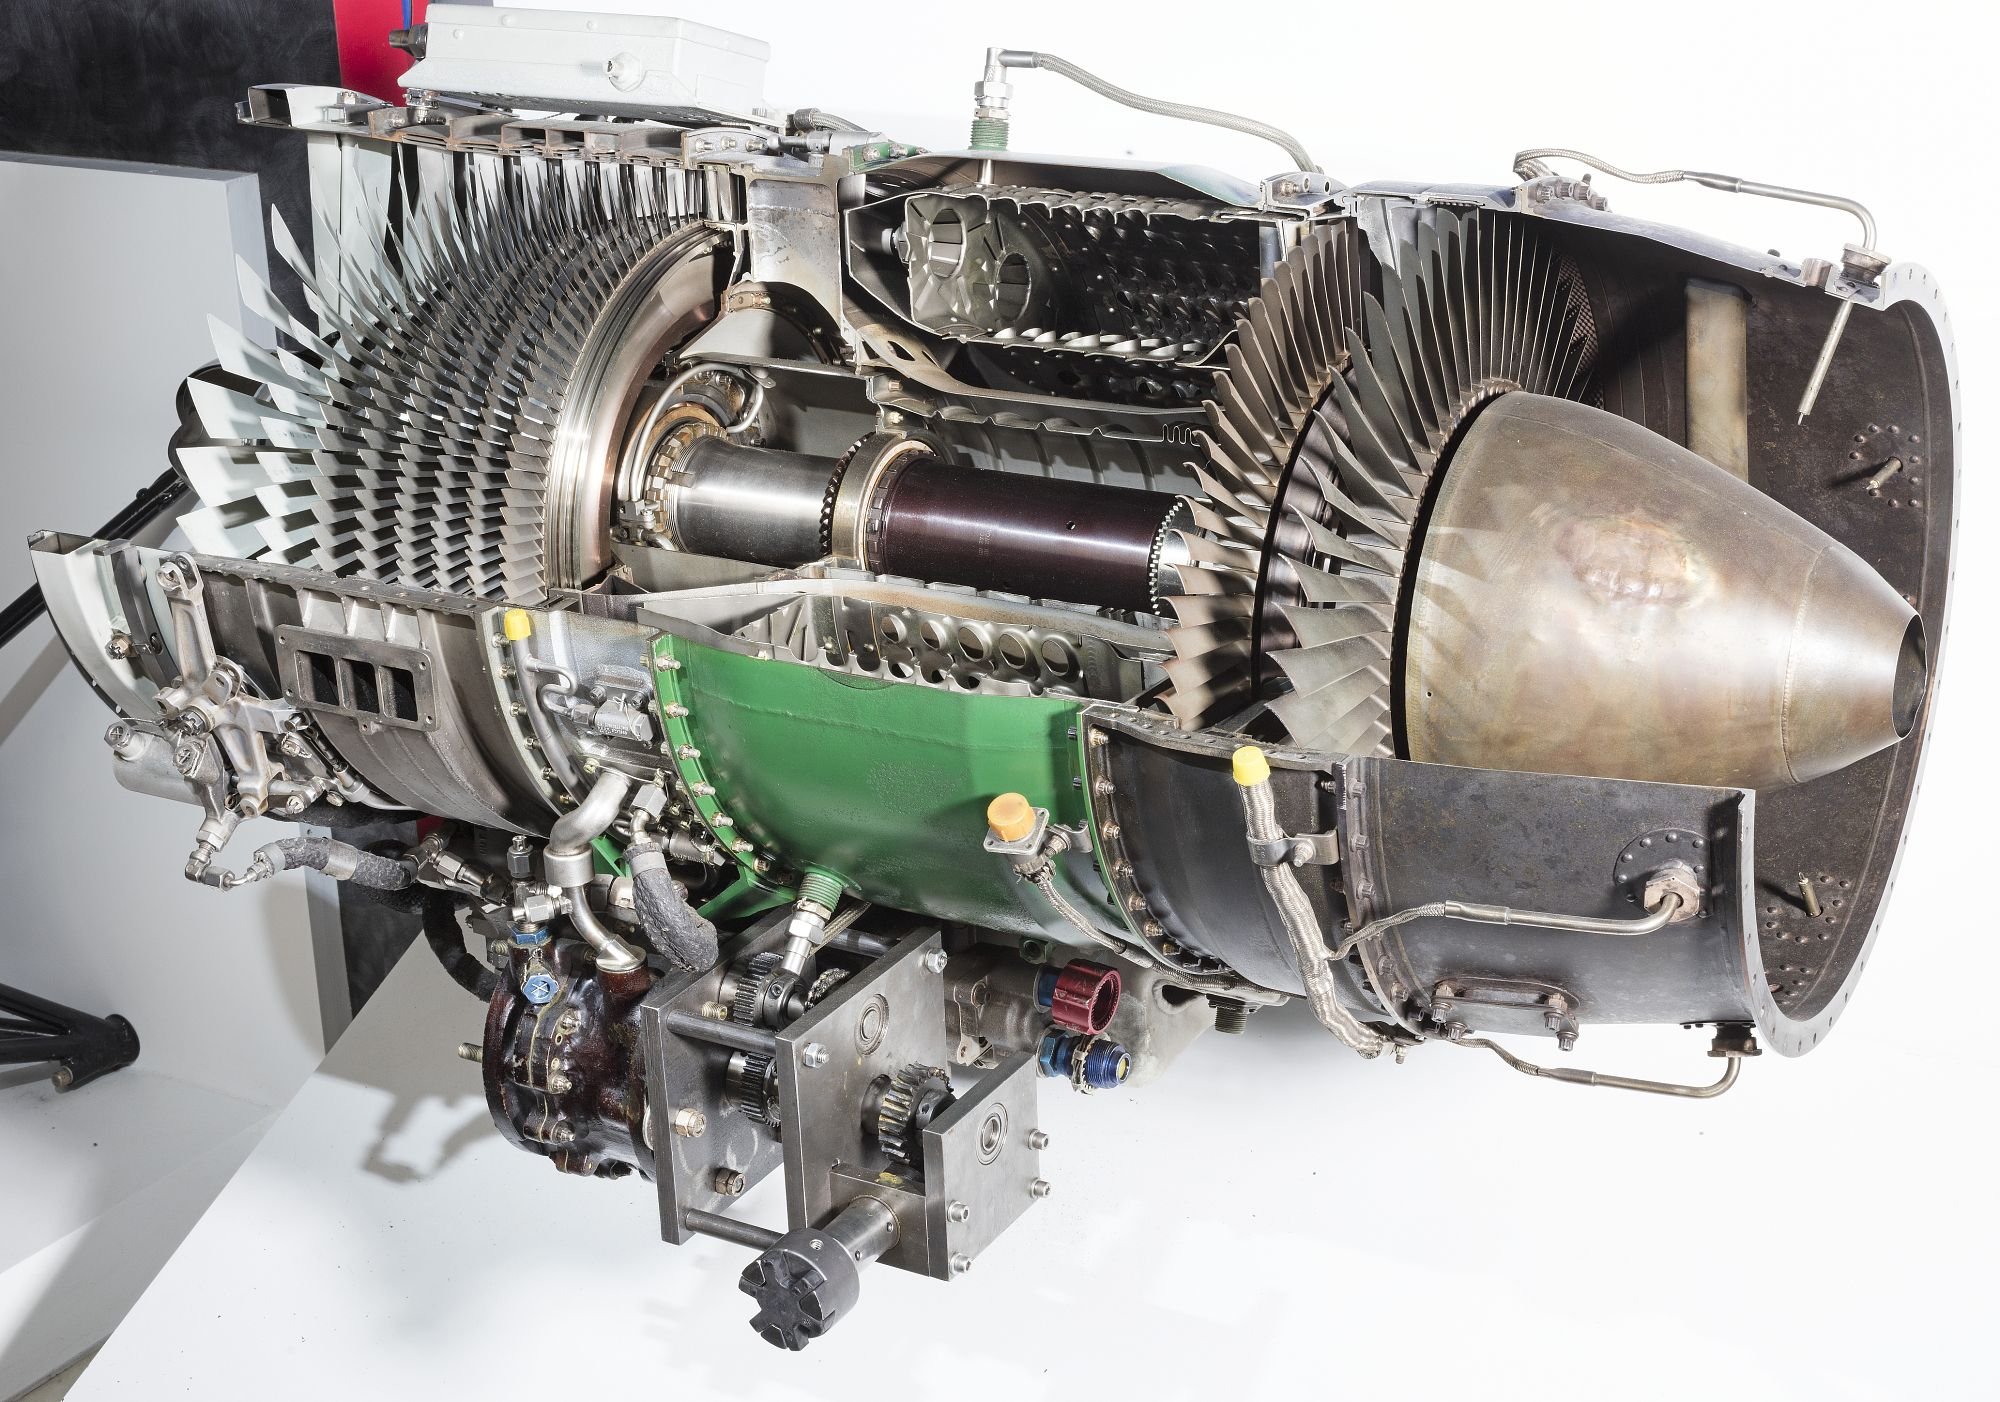 General electric j85ge17a turbojet engine cutaway